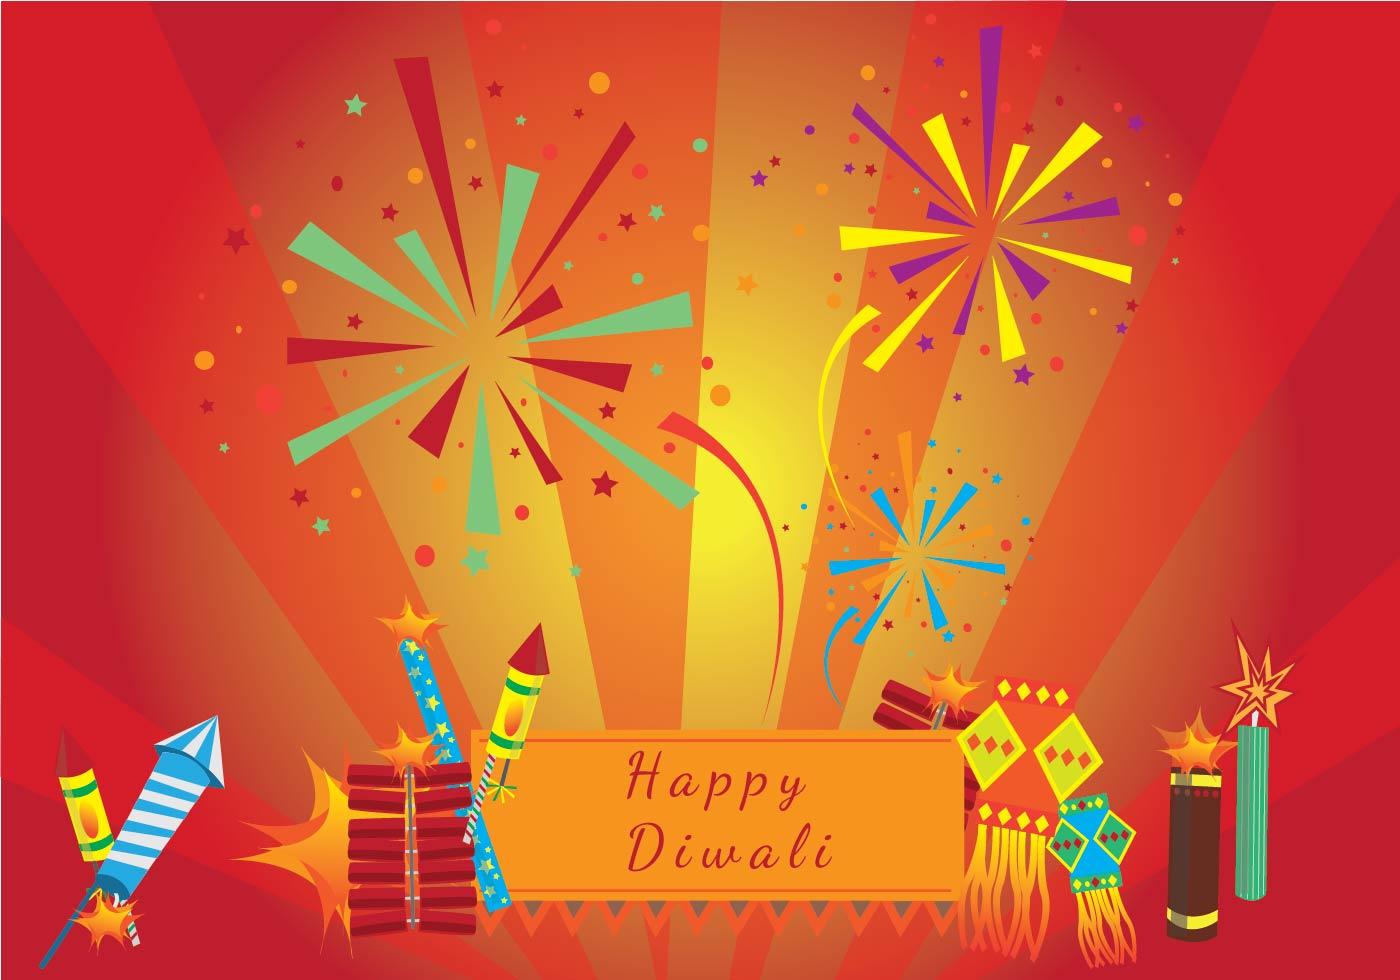 Happy Diwali Festival Download Free Vector Art Stock